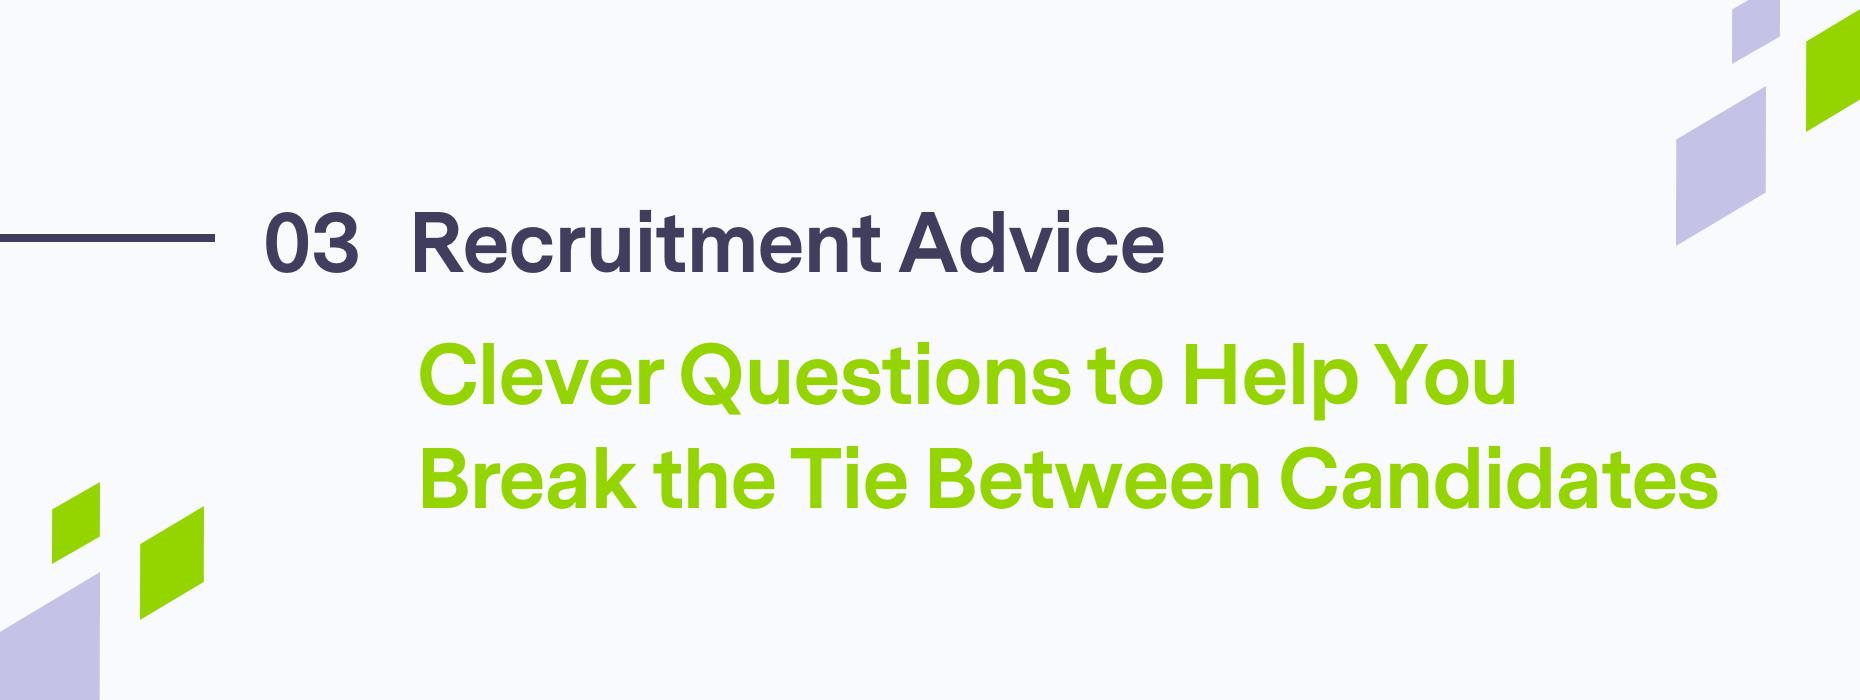 Blog header on Recruitment Advice